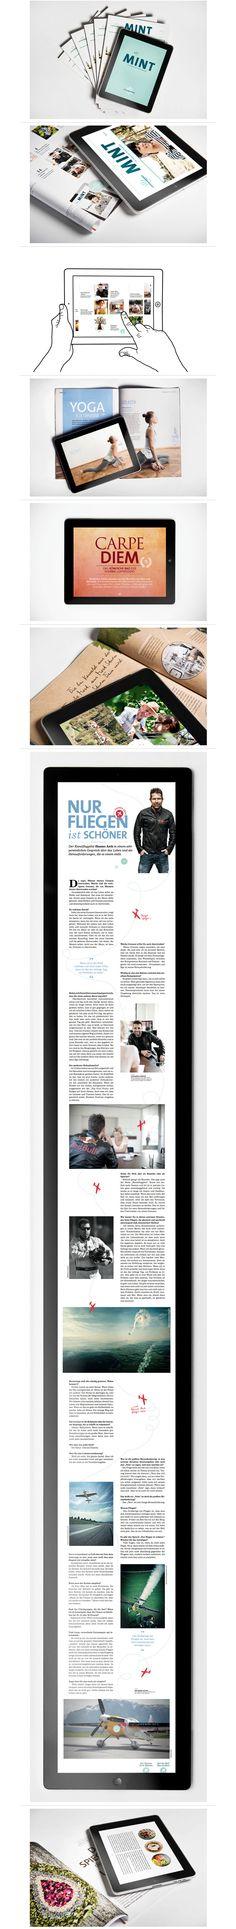 MINT iPad Magazine by moodley brand identity http://www.moodley.at/en/portfolio/digital/mint-fuers-ipad.html